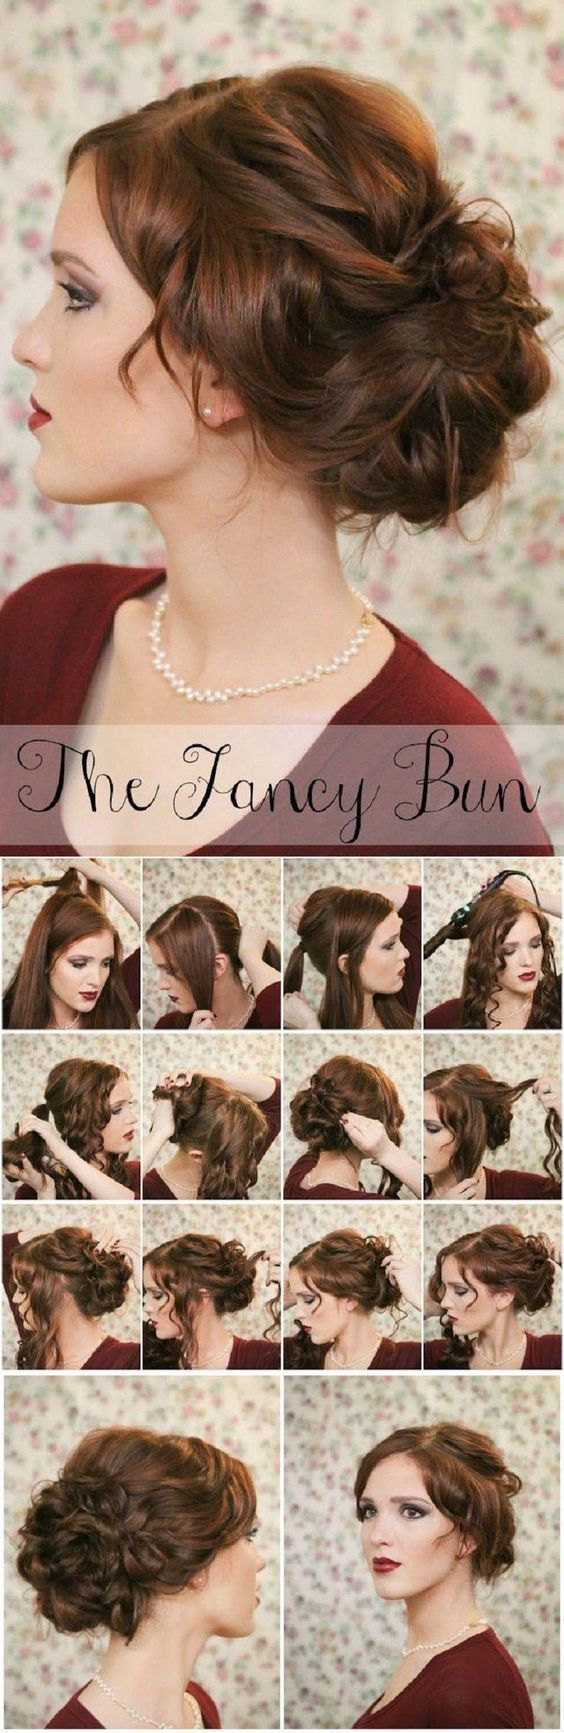 Vintage diy updo wedding hairstyles diy wedding hair pinterest